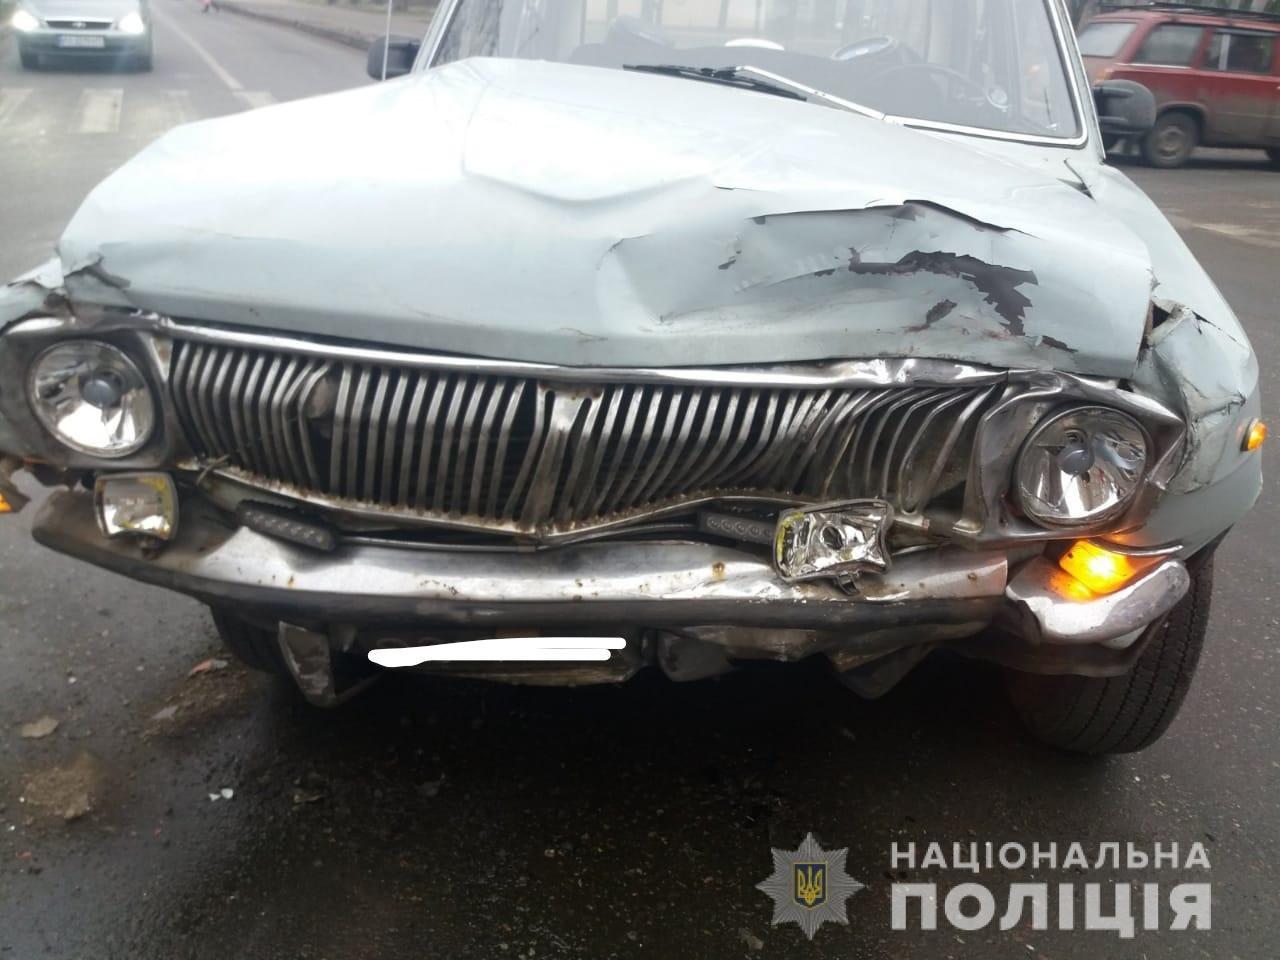 В Харькове столкнулись два автомобиля. Пострадал 6-летний ребенок, - ФОТО, фото-2